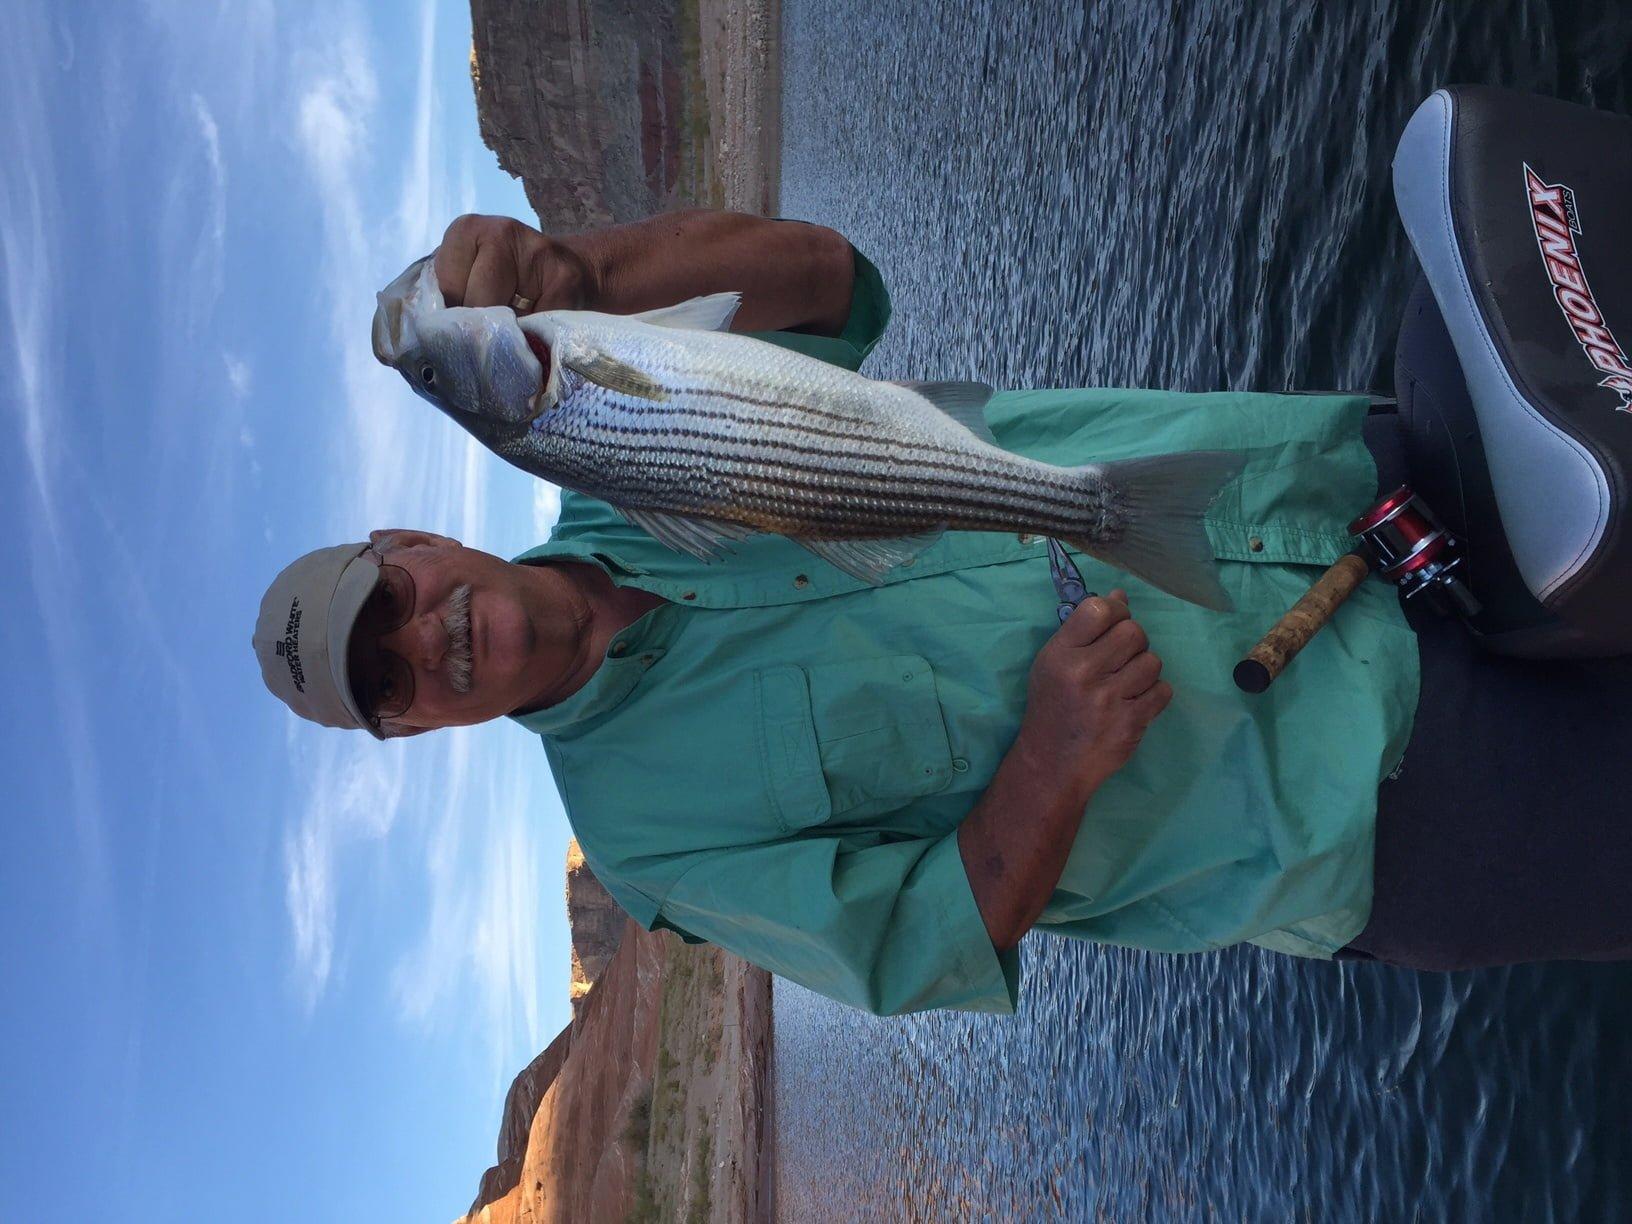 Lake powell fishing report by wayne gustaveson 9 30 15 for Lake powell fishing